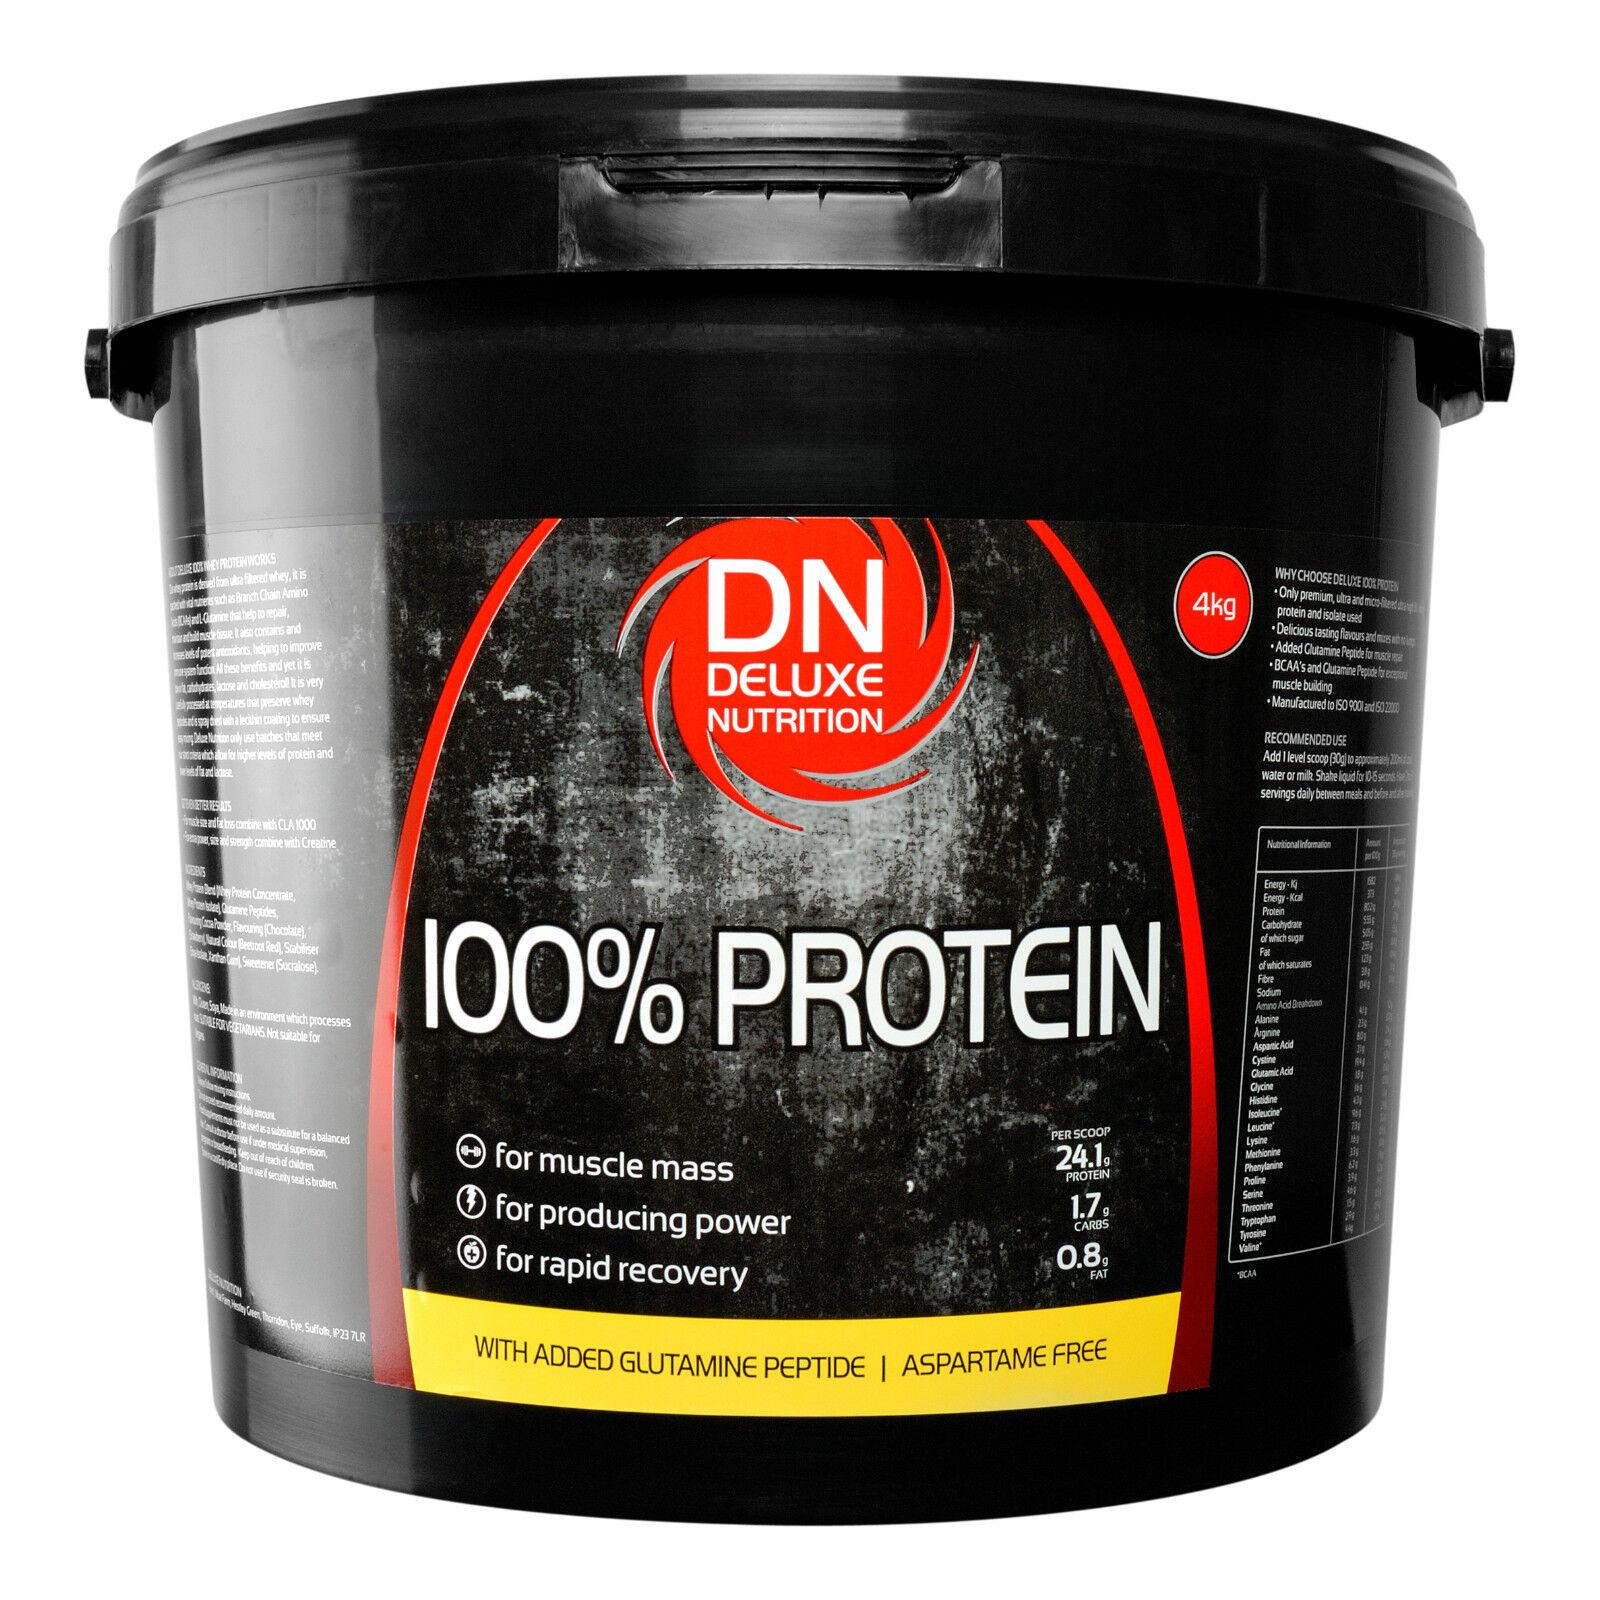 DELUXE Nutrition 100% PROTEINA SIERO DI LATTE ISOLARE 1Kg, 4kg